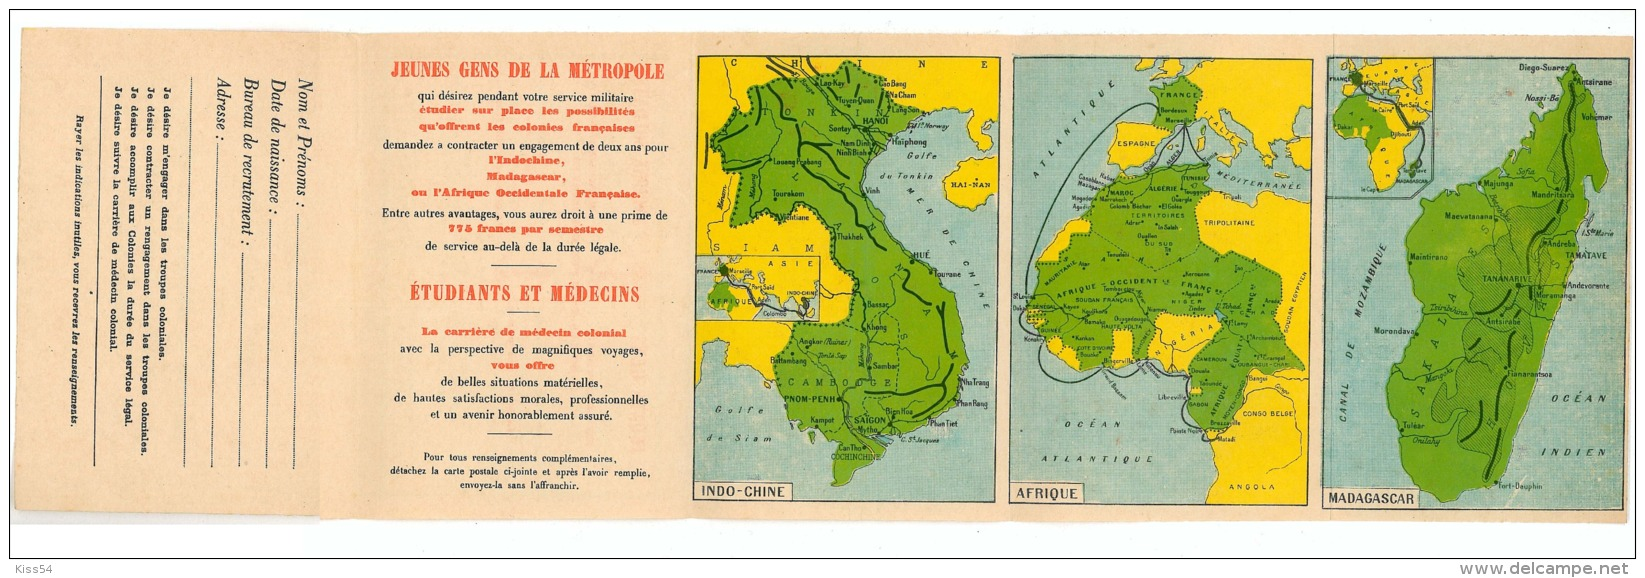 C 100 - ( 7421 ) Cambodia - Map, Temple, INDO-CHINE, Direction De Troupes Coloniales - Old Postcard - Unused - Cambodia